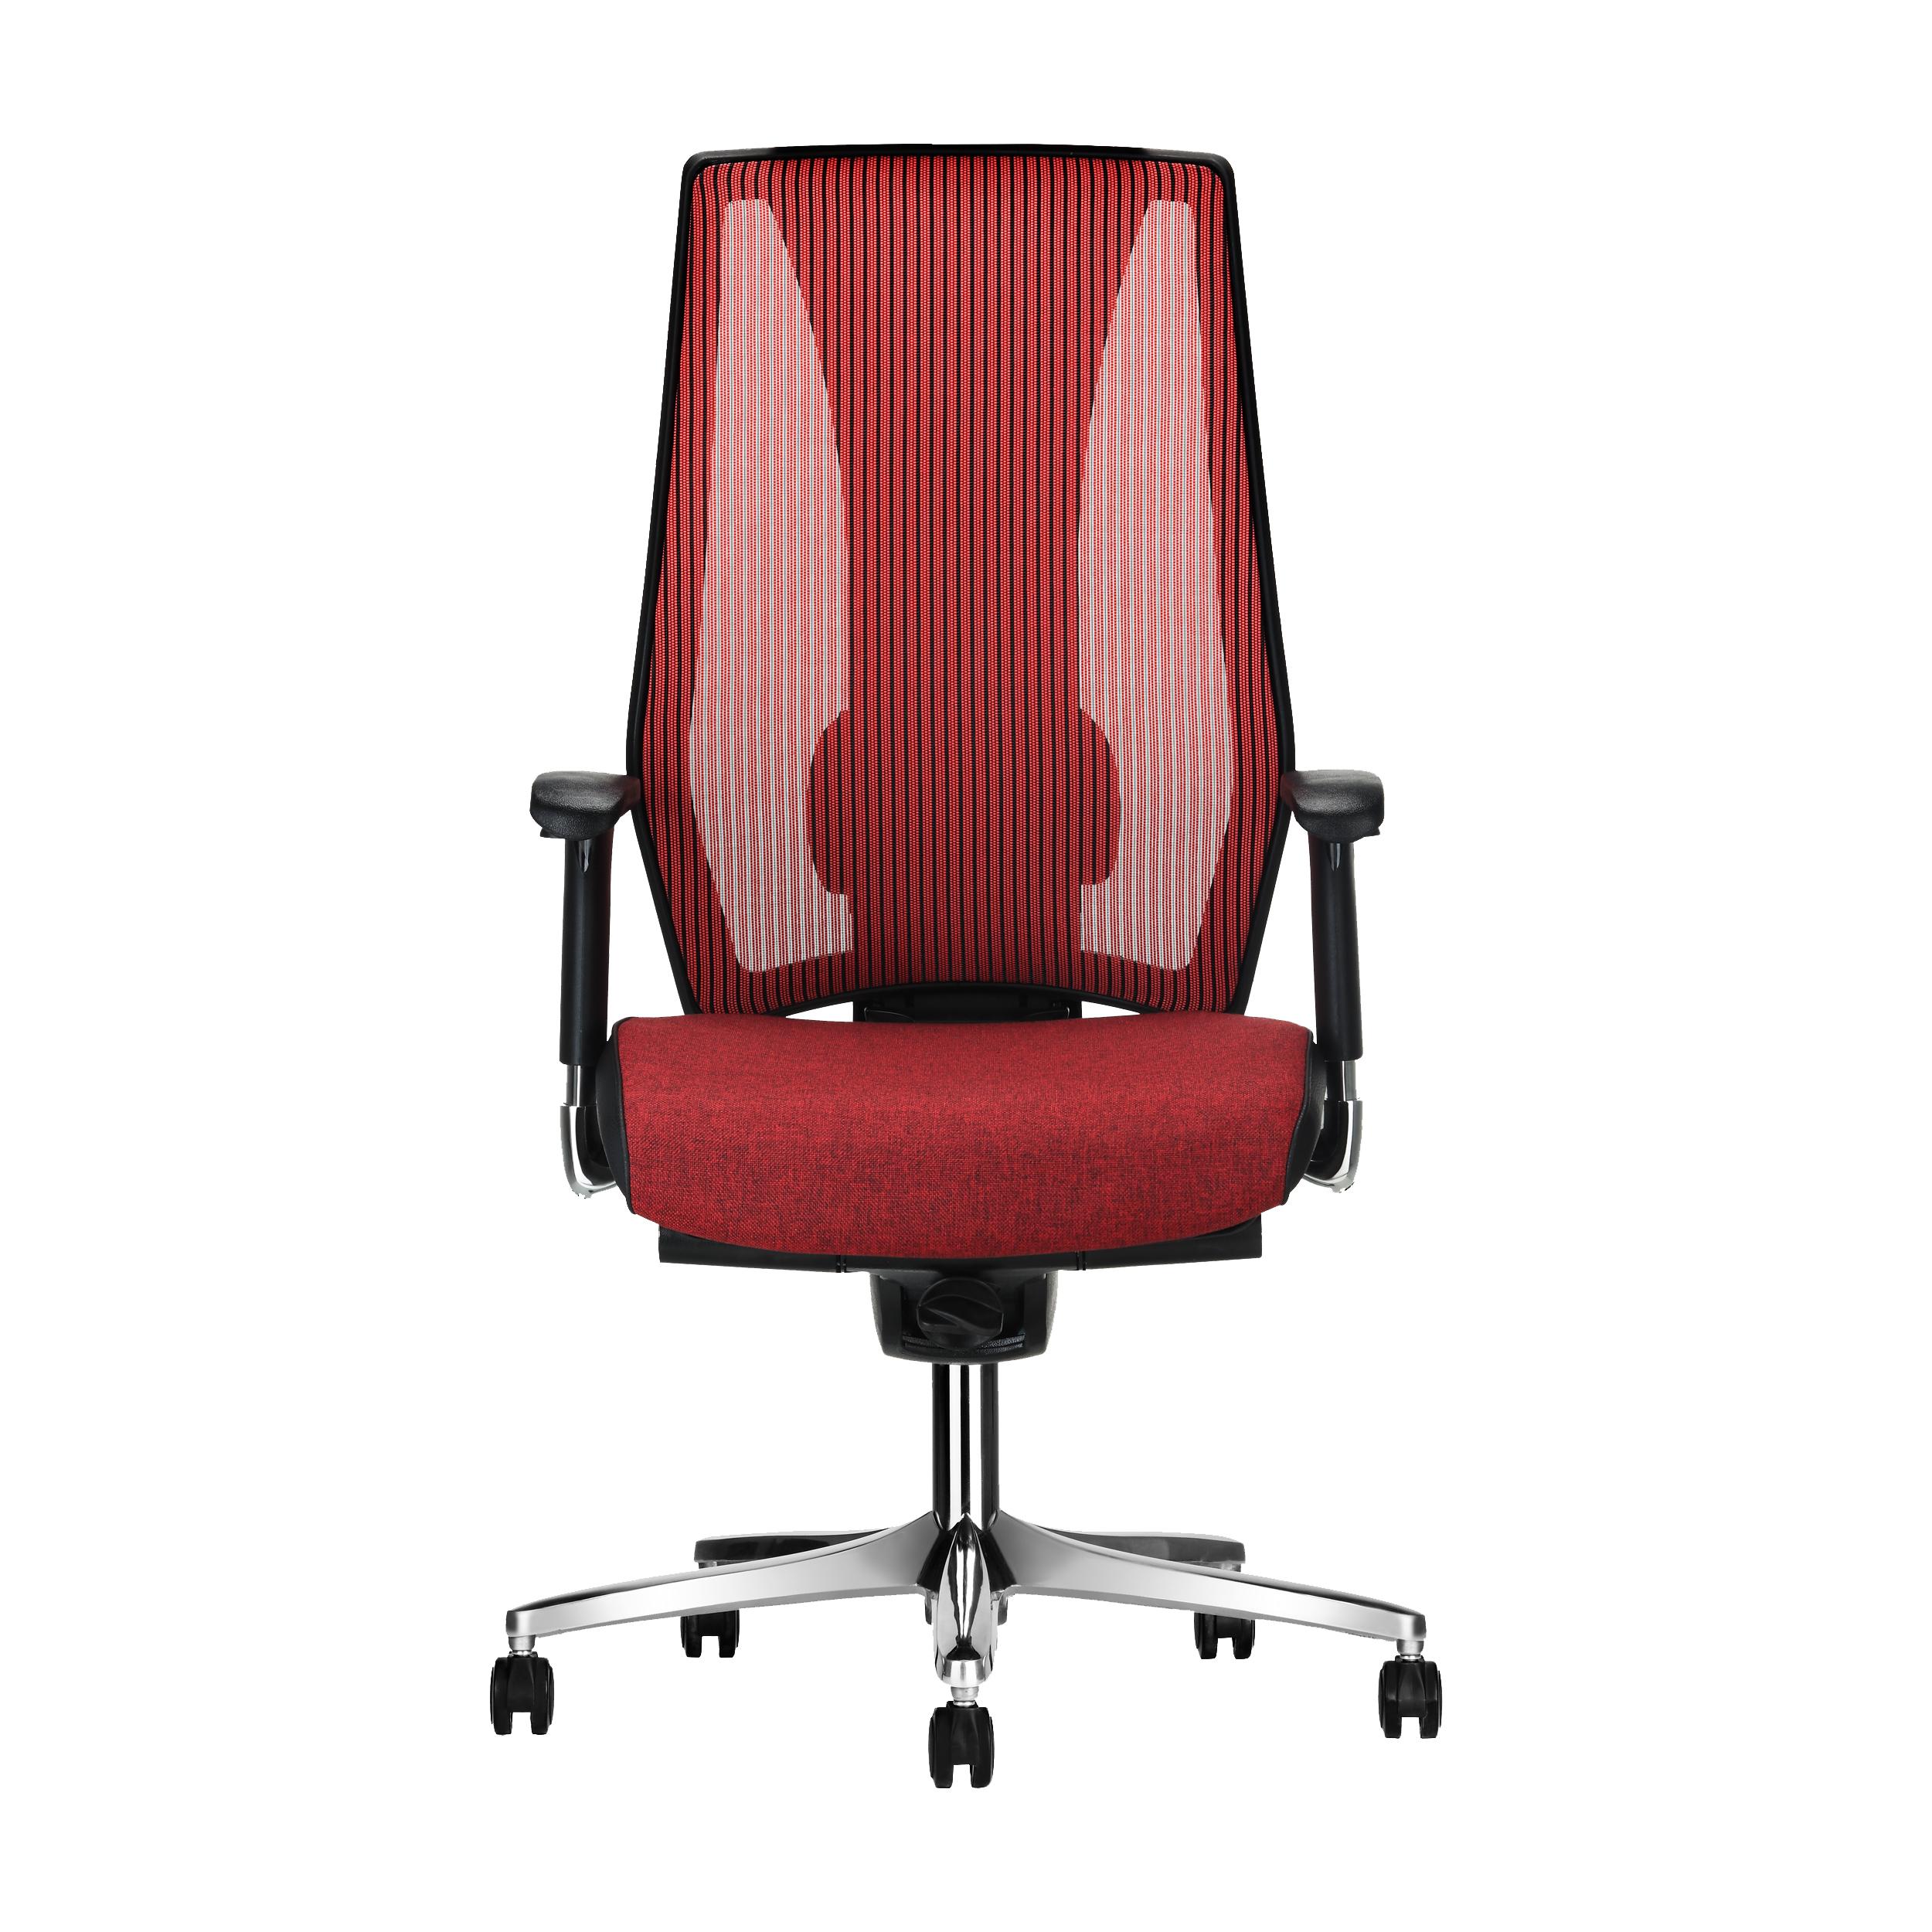 صندلی کارشناسی مدل B18d